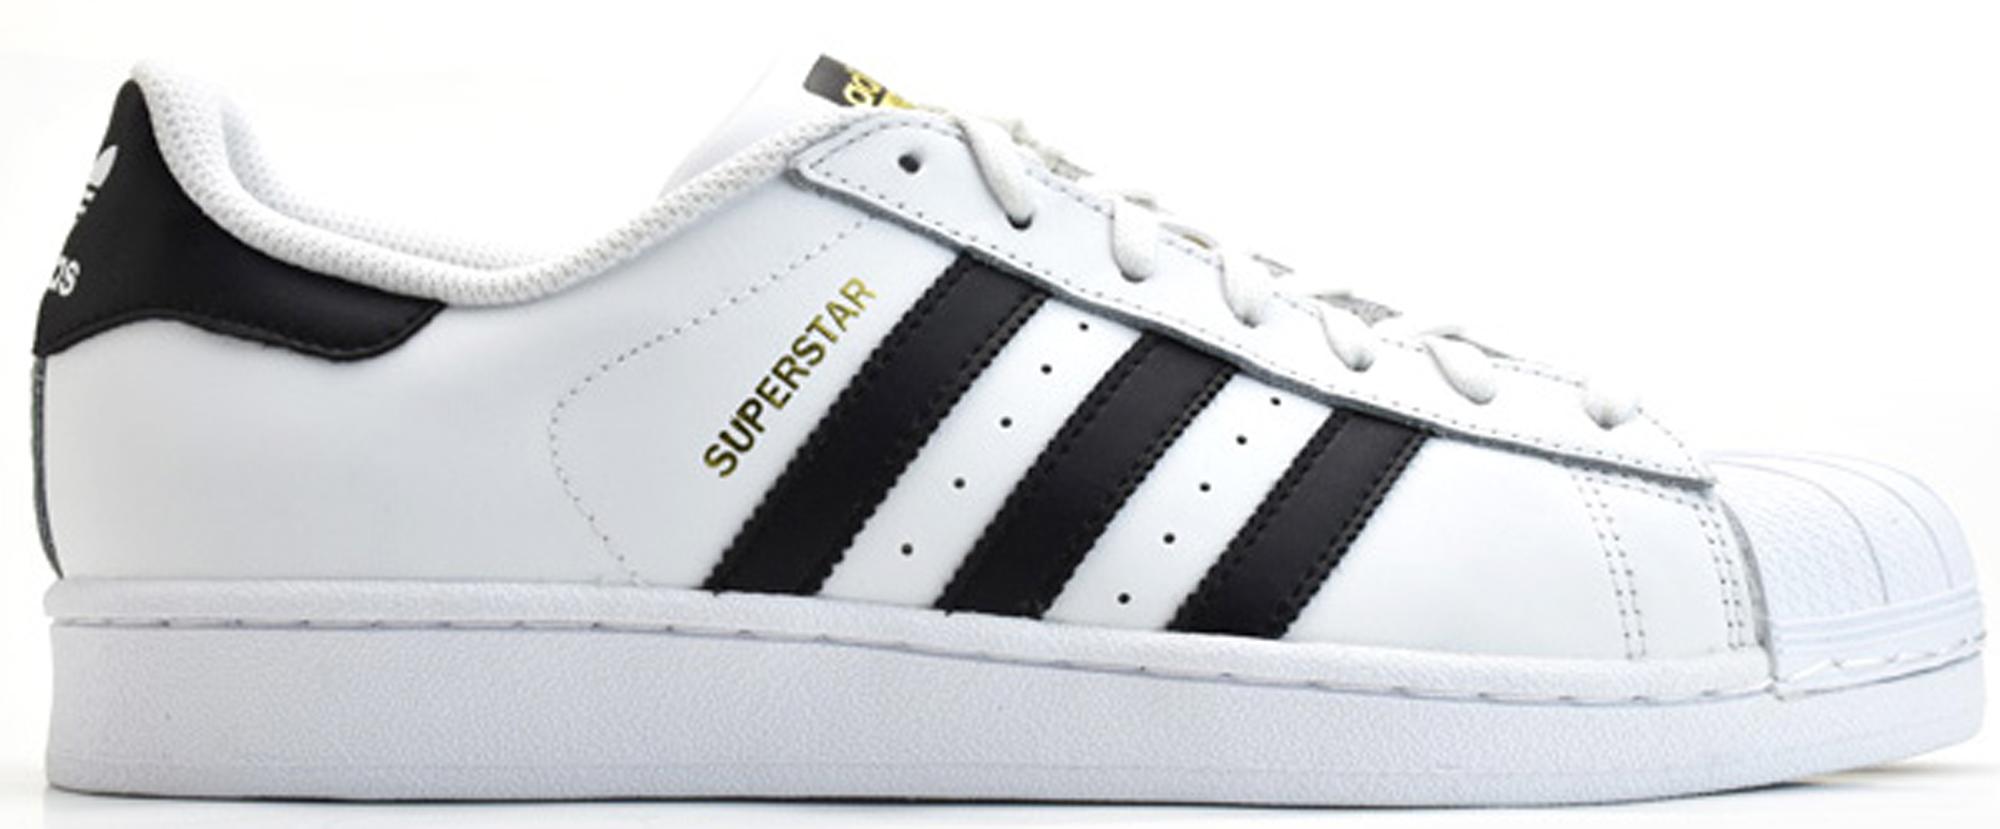 adidas Superstar Cloud White Core Black